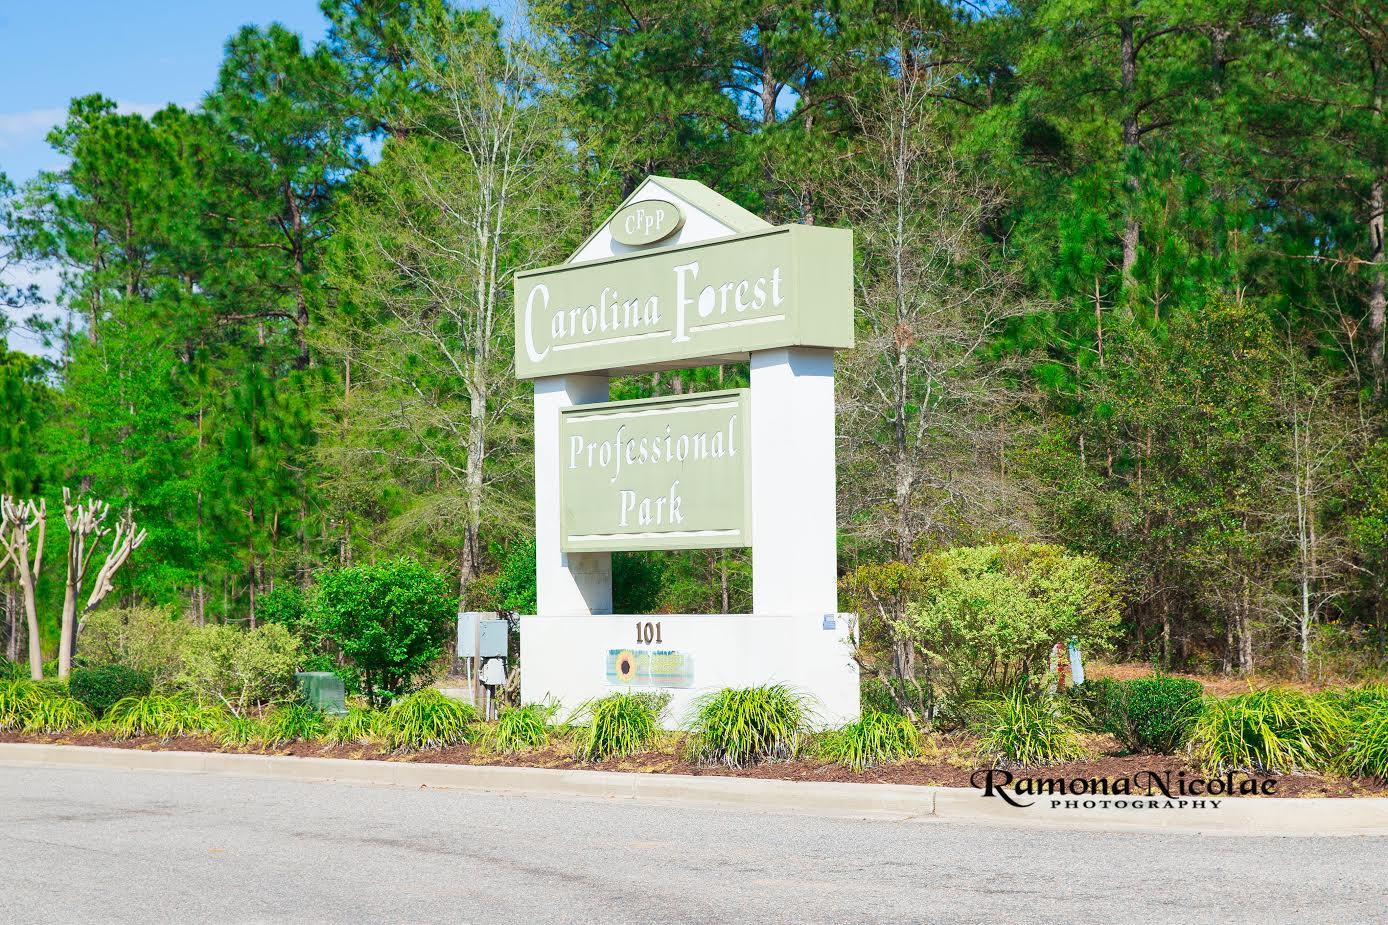 Professional Park Carolina Forest